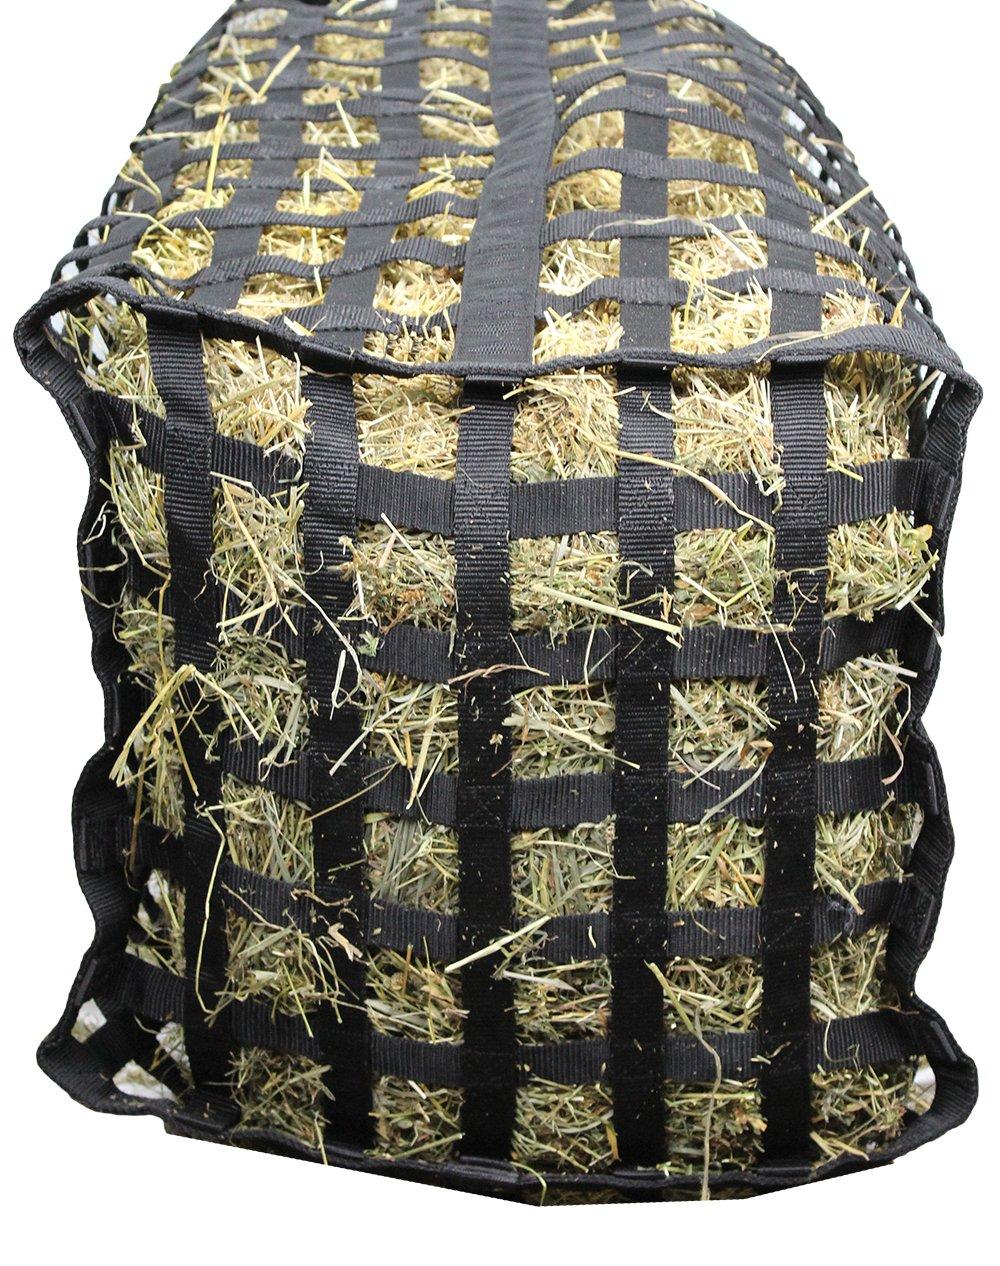 Derby Originals XL Go Around 4 Sided Slow Feed Hay Bale Bag Patented (Black) by Derby Originals (Image #6)